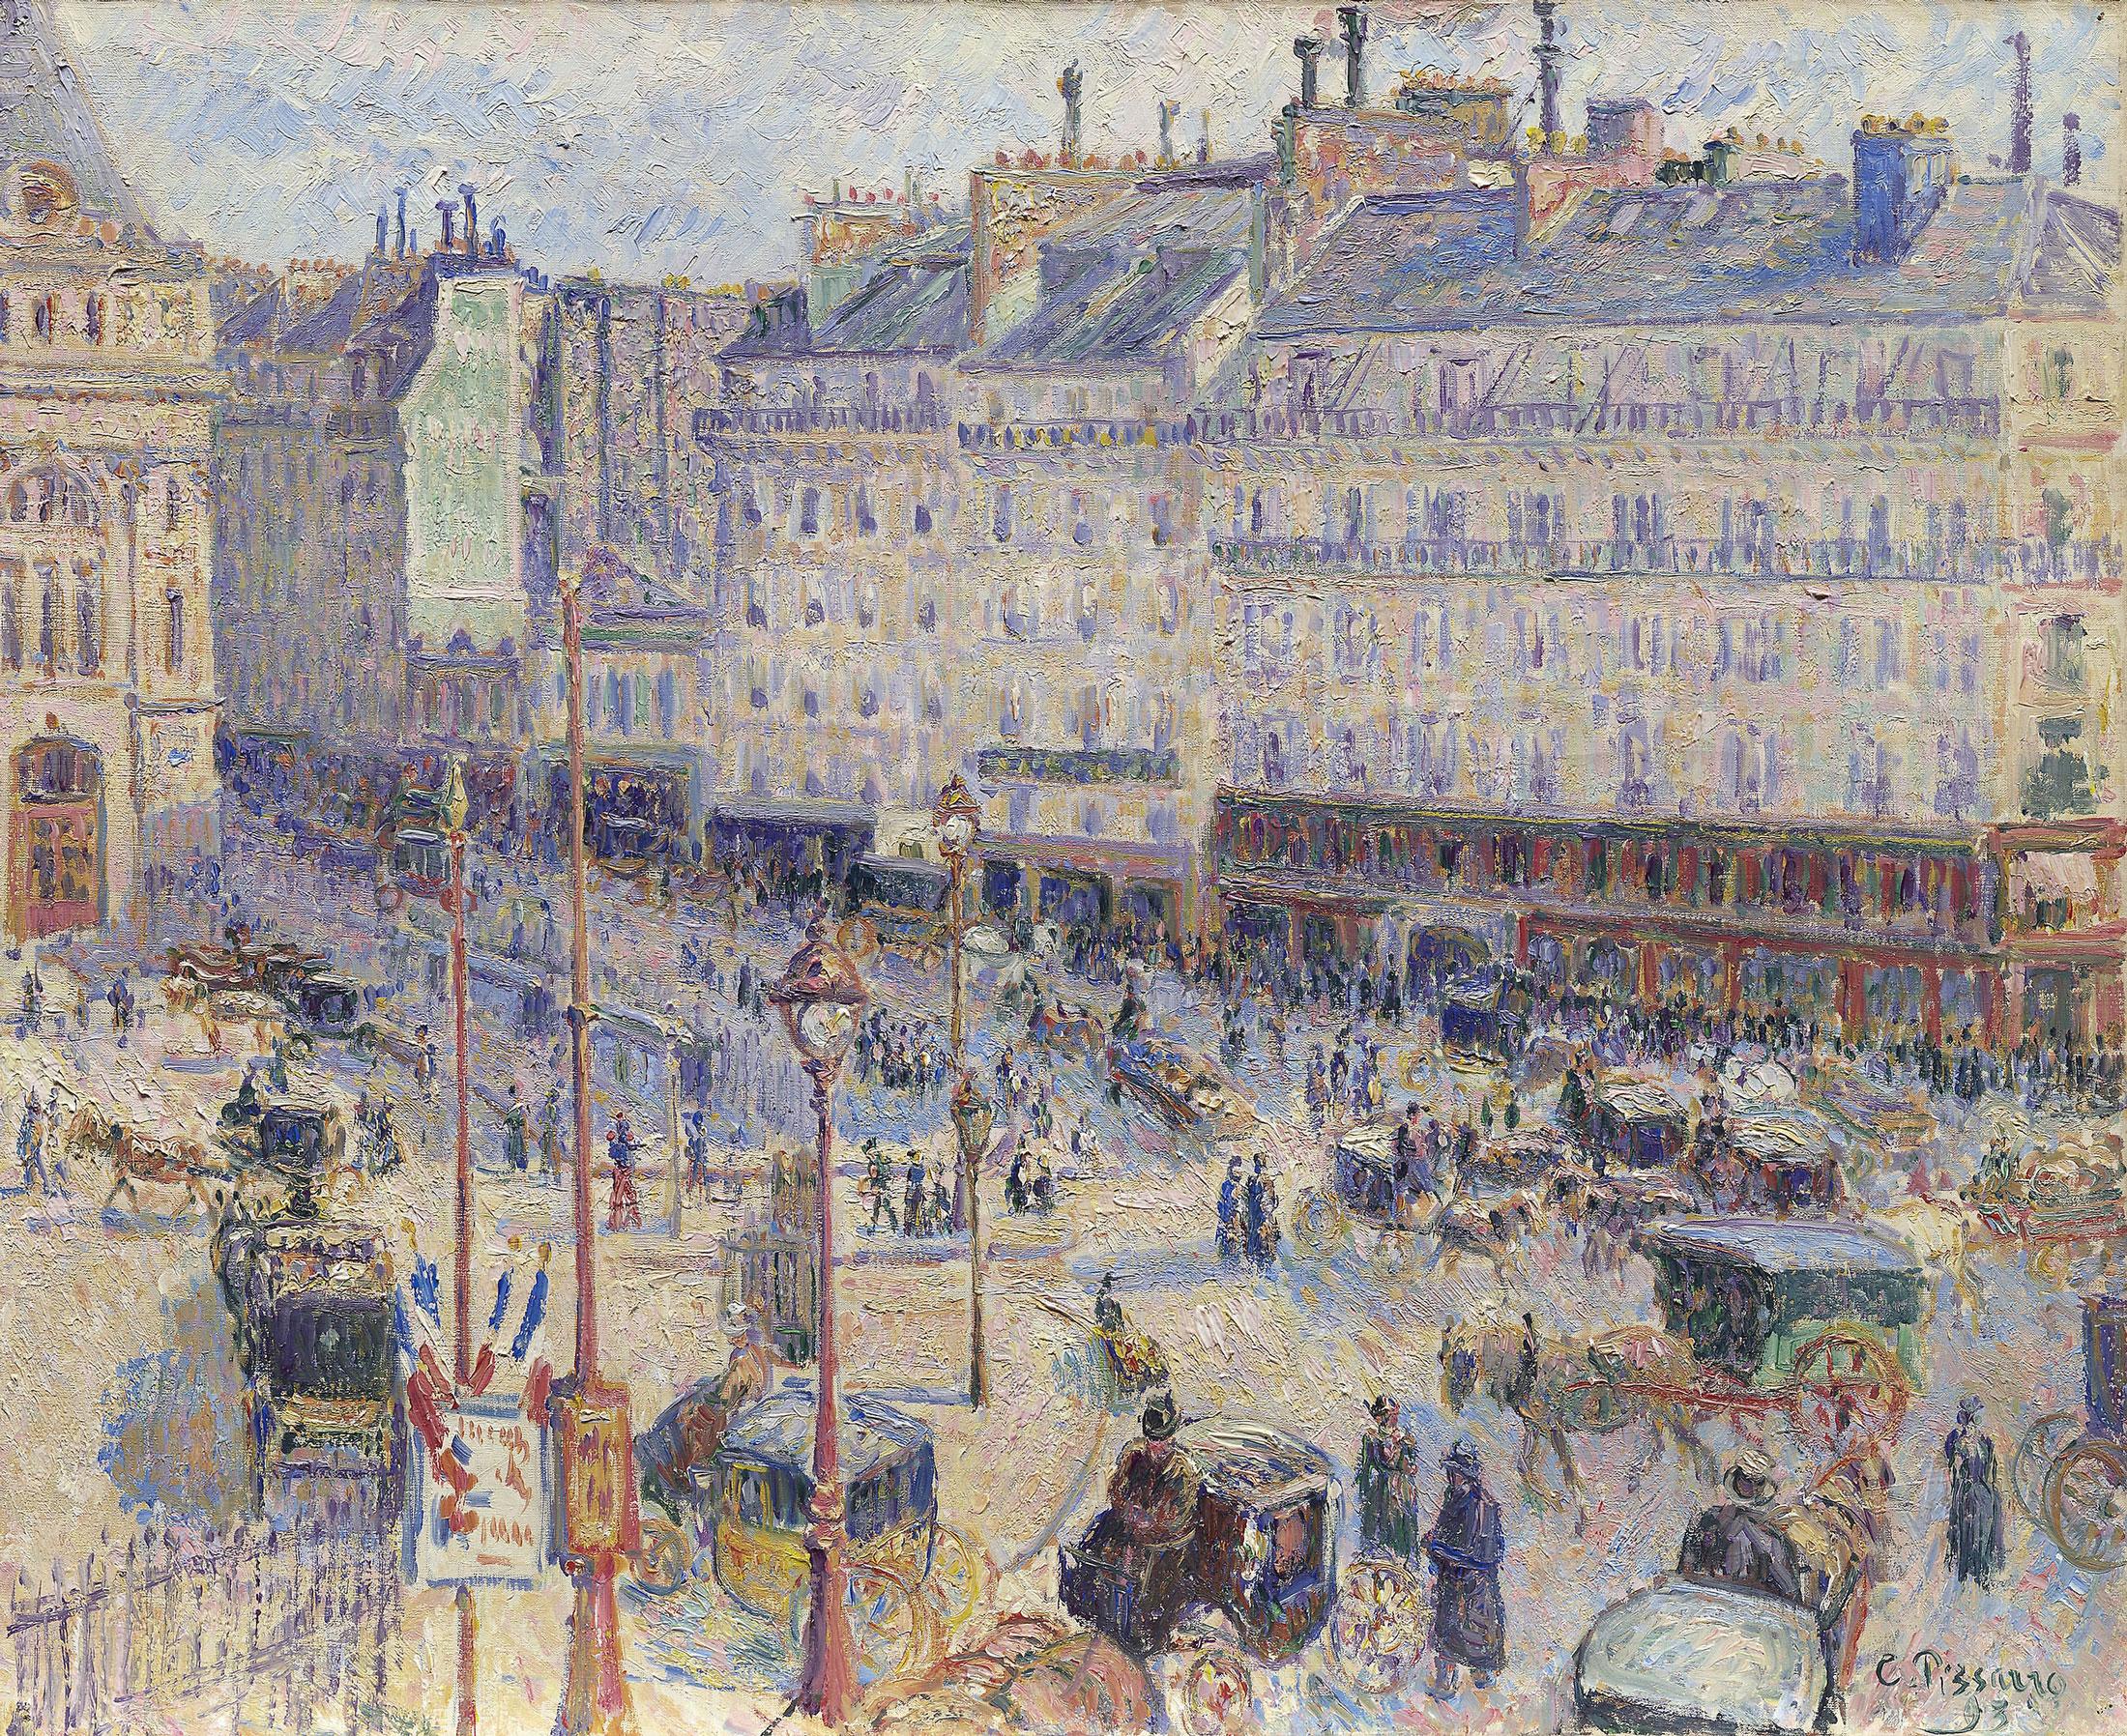 Camille Pissarro - Place du Havre, 1893, Bilderrahmen Ahorn